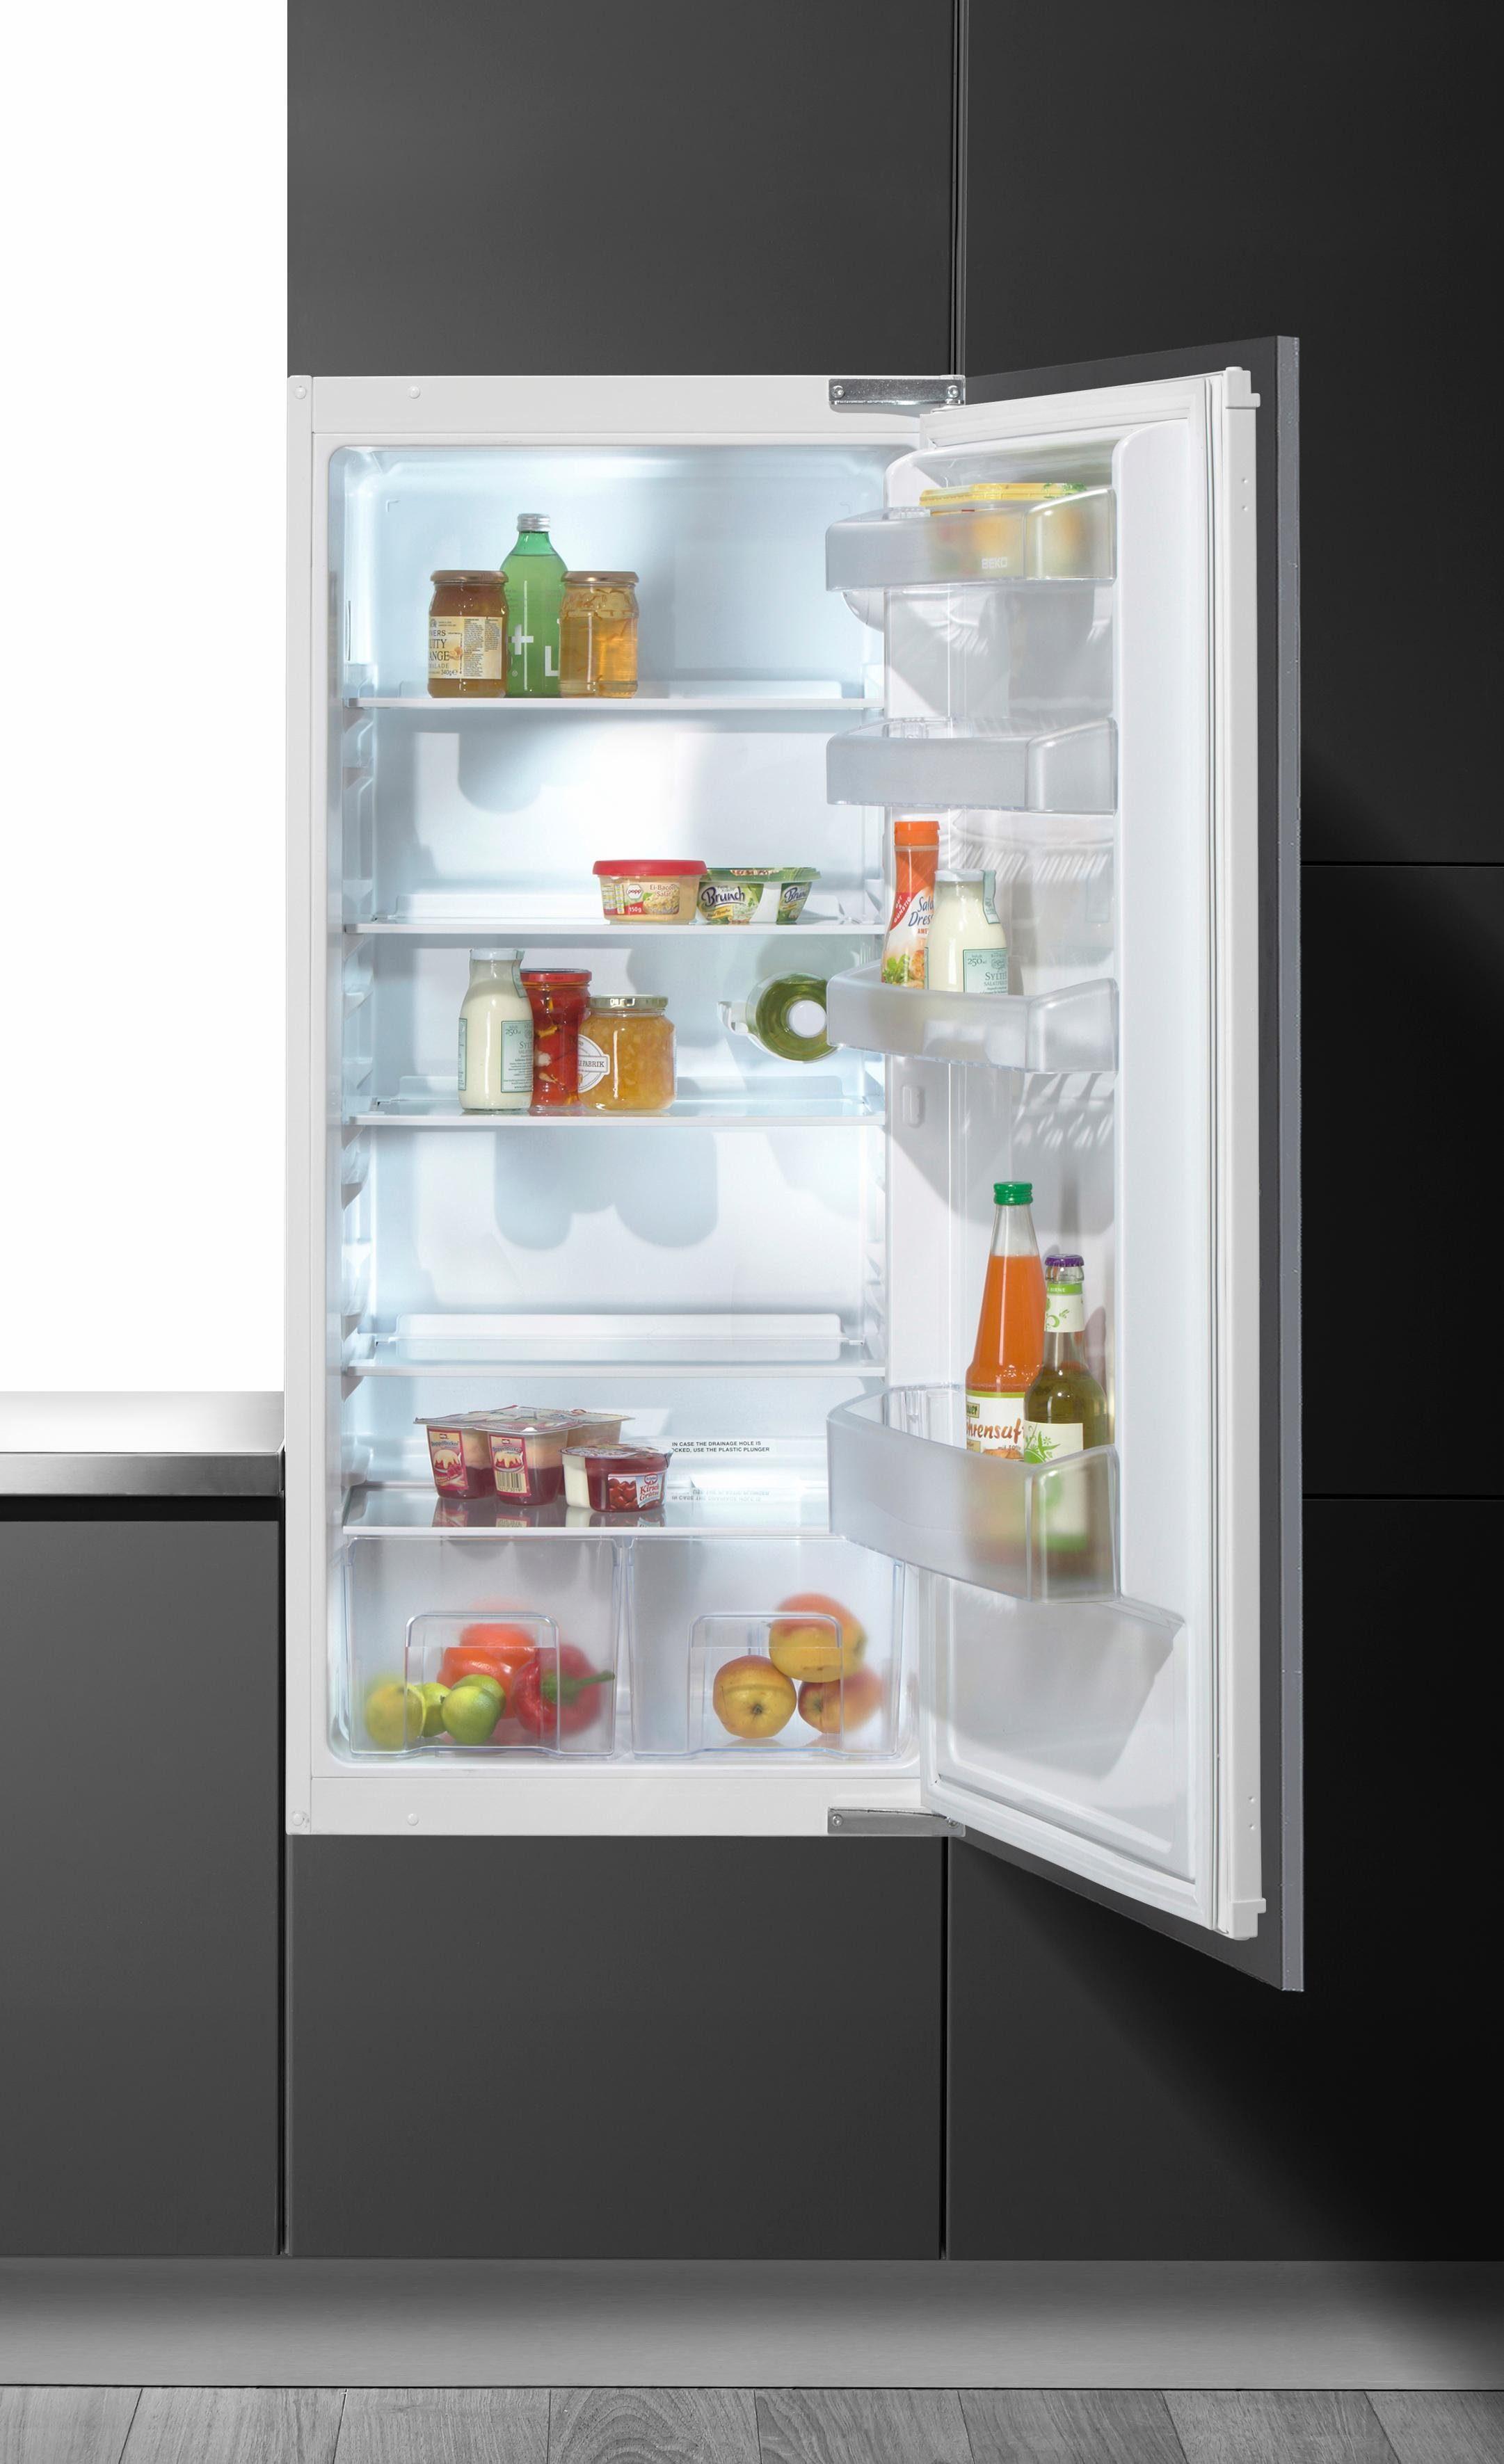 Beko integrierbarer Einbaukühlschrank »LBI 2201«, A+, 121,6-122,9 cm